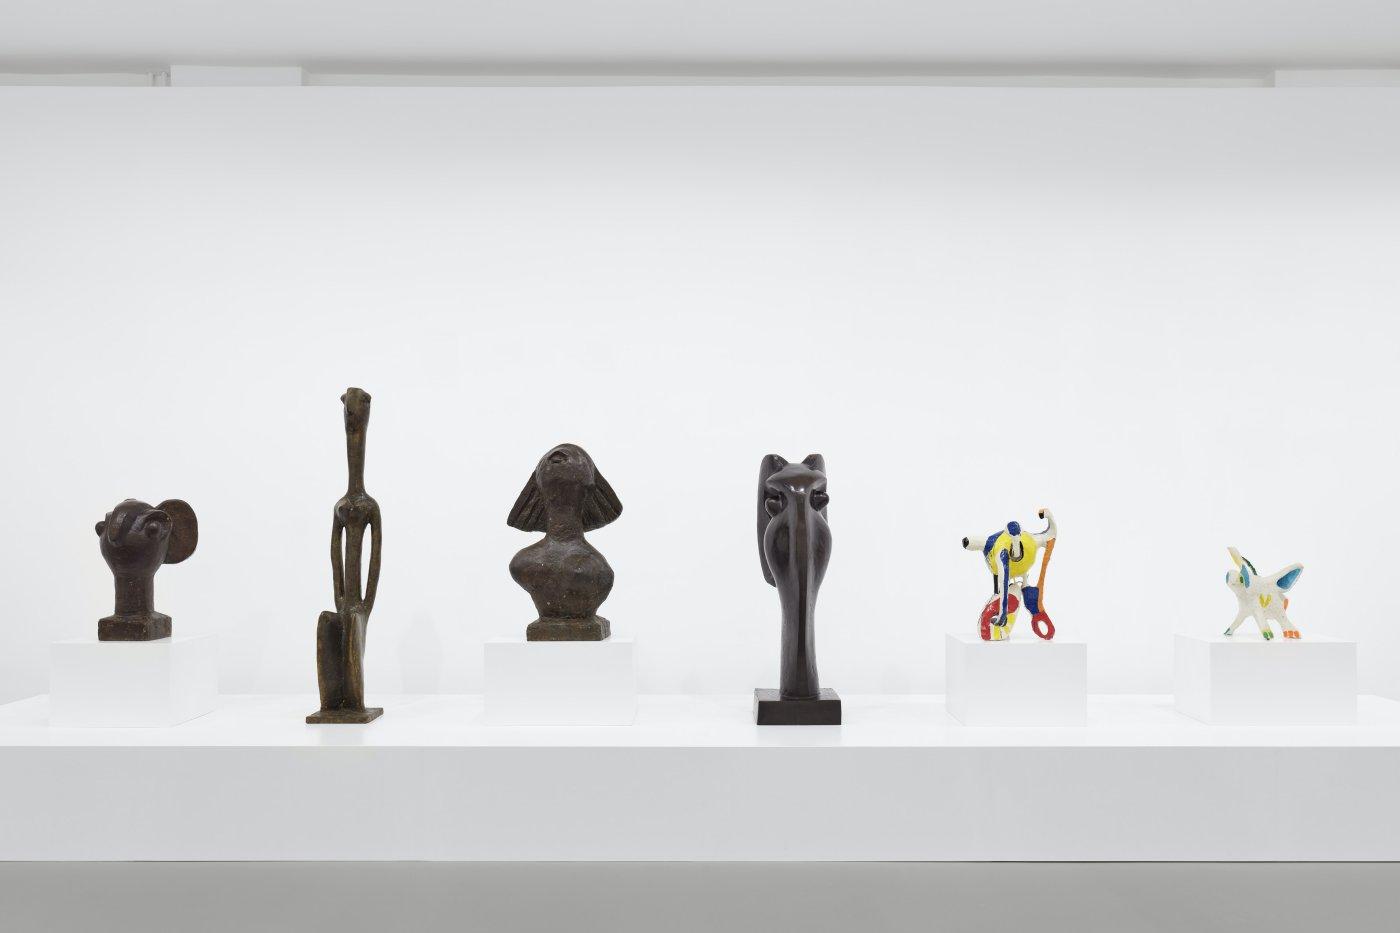 Galerie Max Hetzler Goethestrasse Karel Appel 4